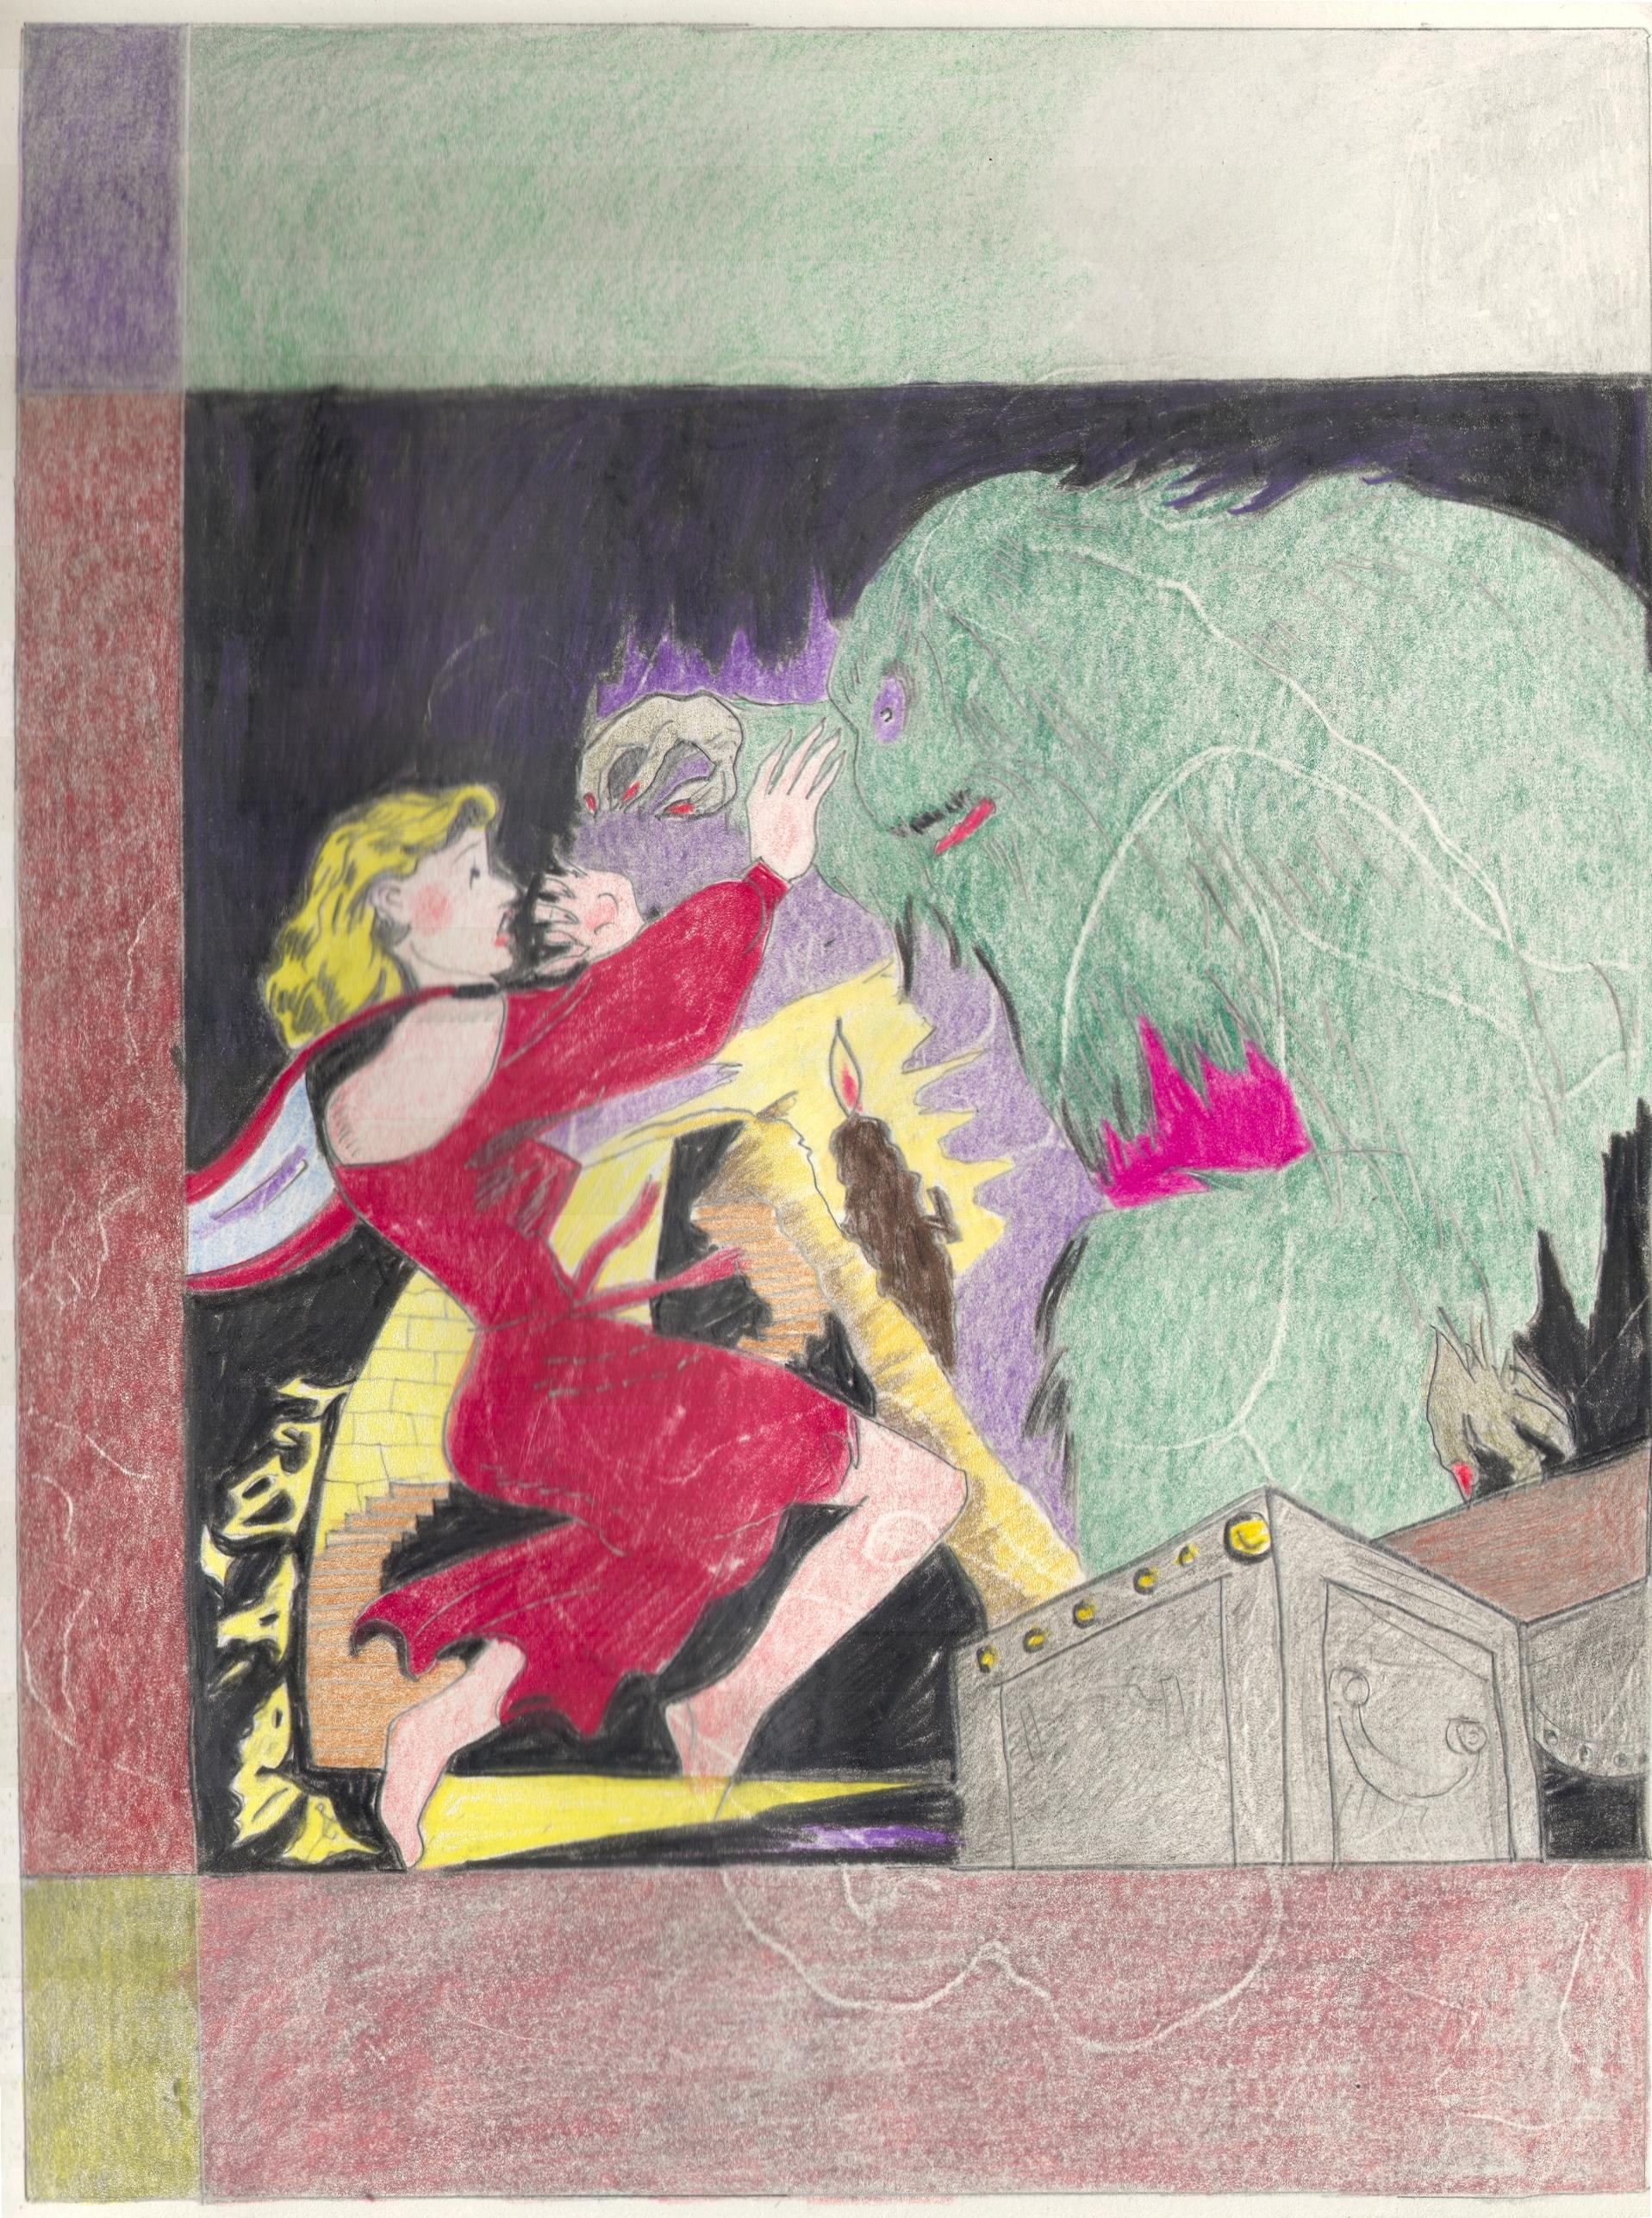 O.T. ( Serie Weird Tales ), 2018  Bleistift Buntstift auf Papier, 26x35.5cm